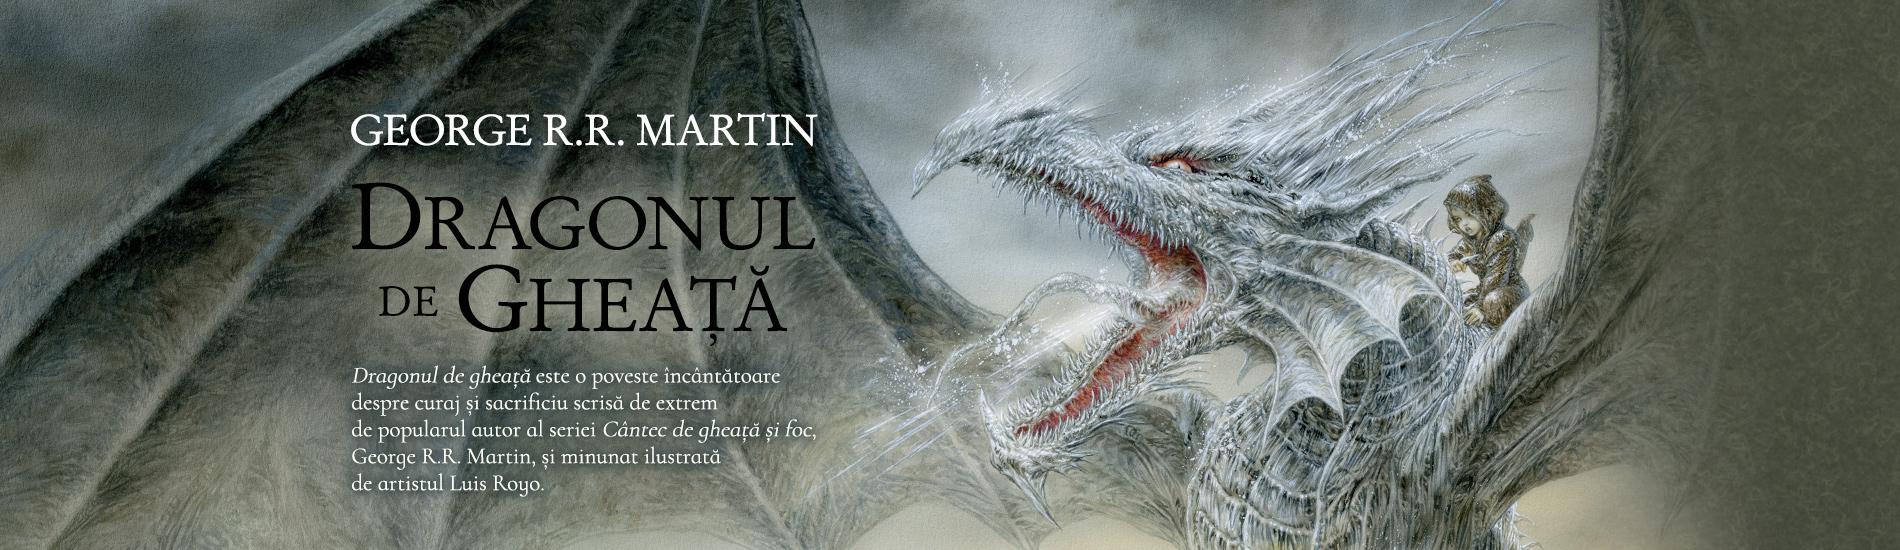 dragonul_1900p550blurb